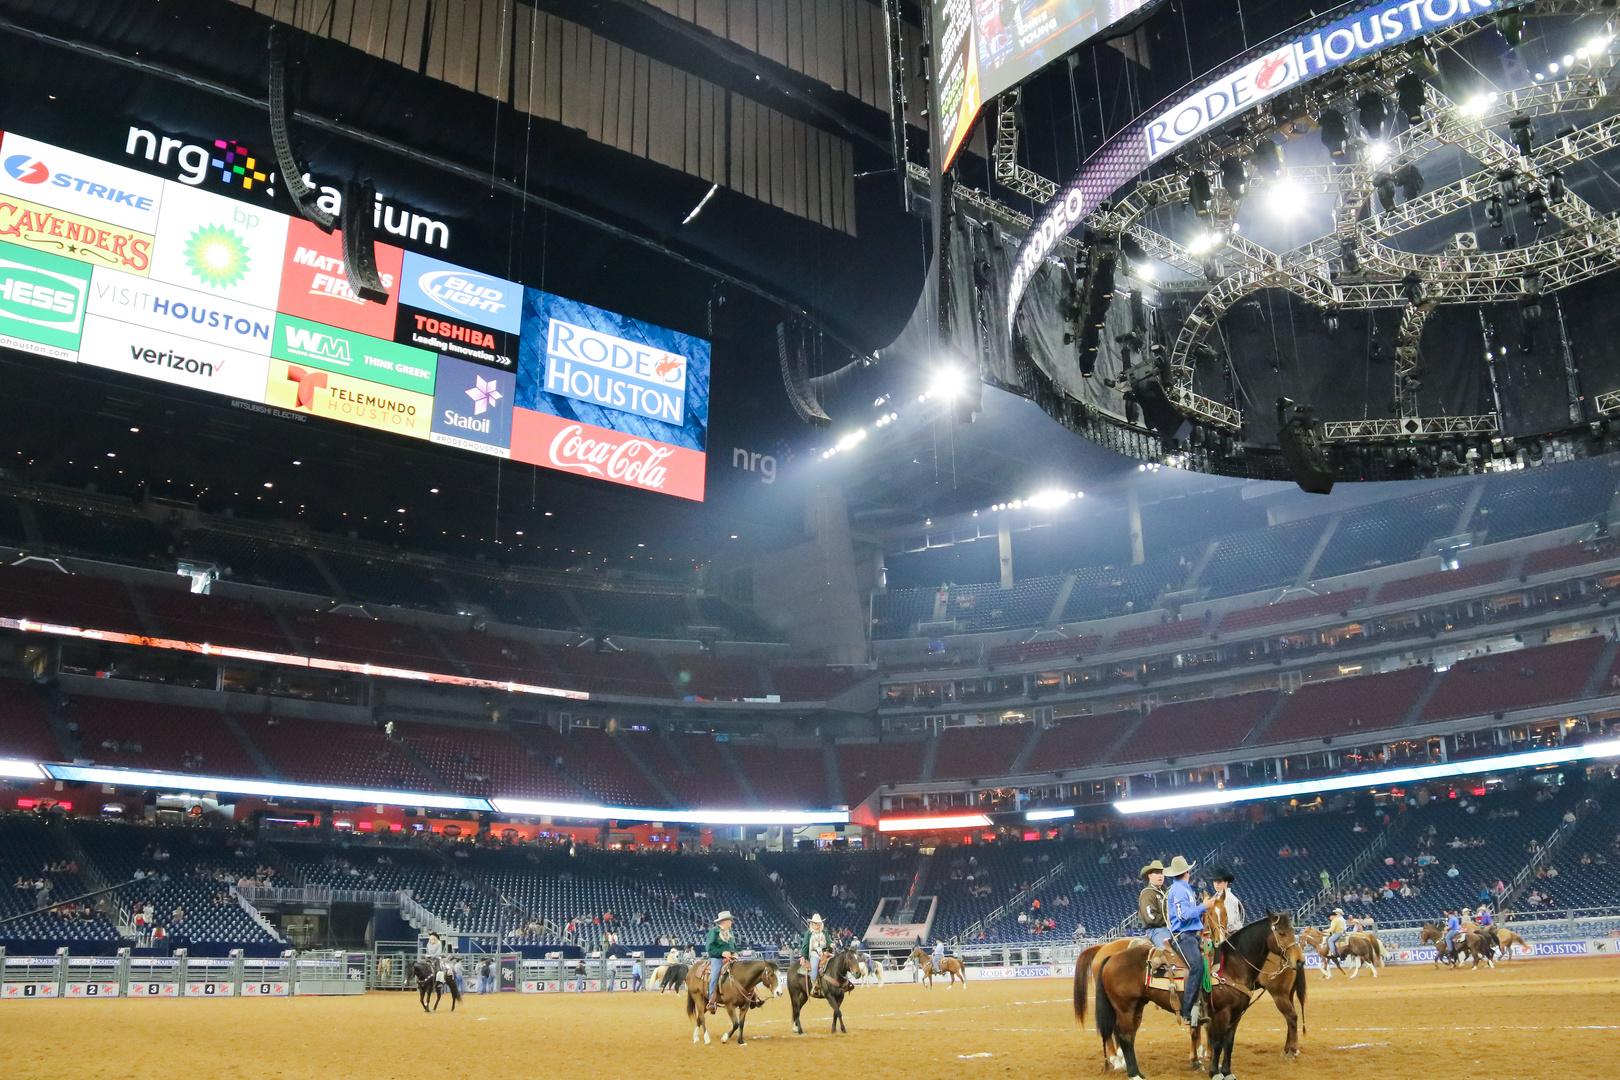 Houston rodeo stadium